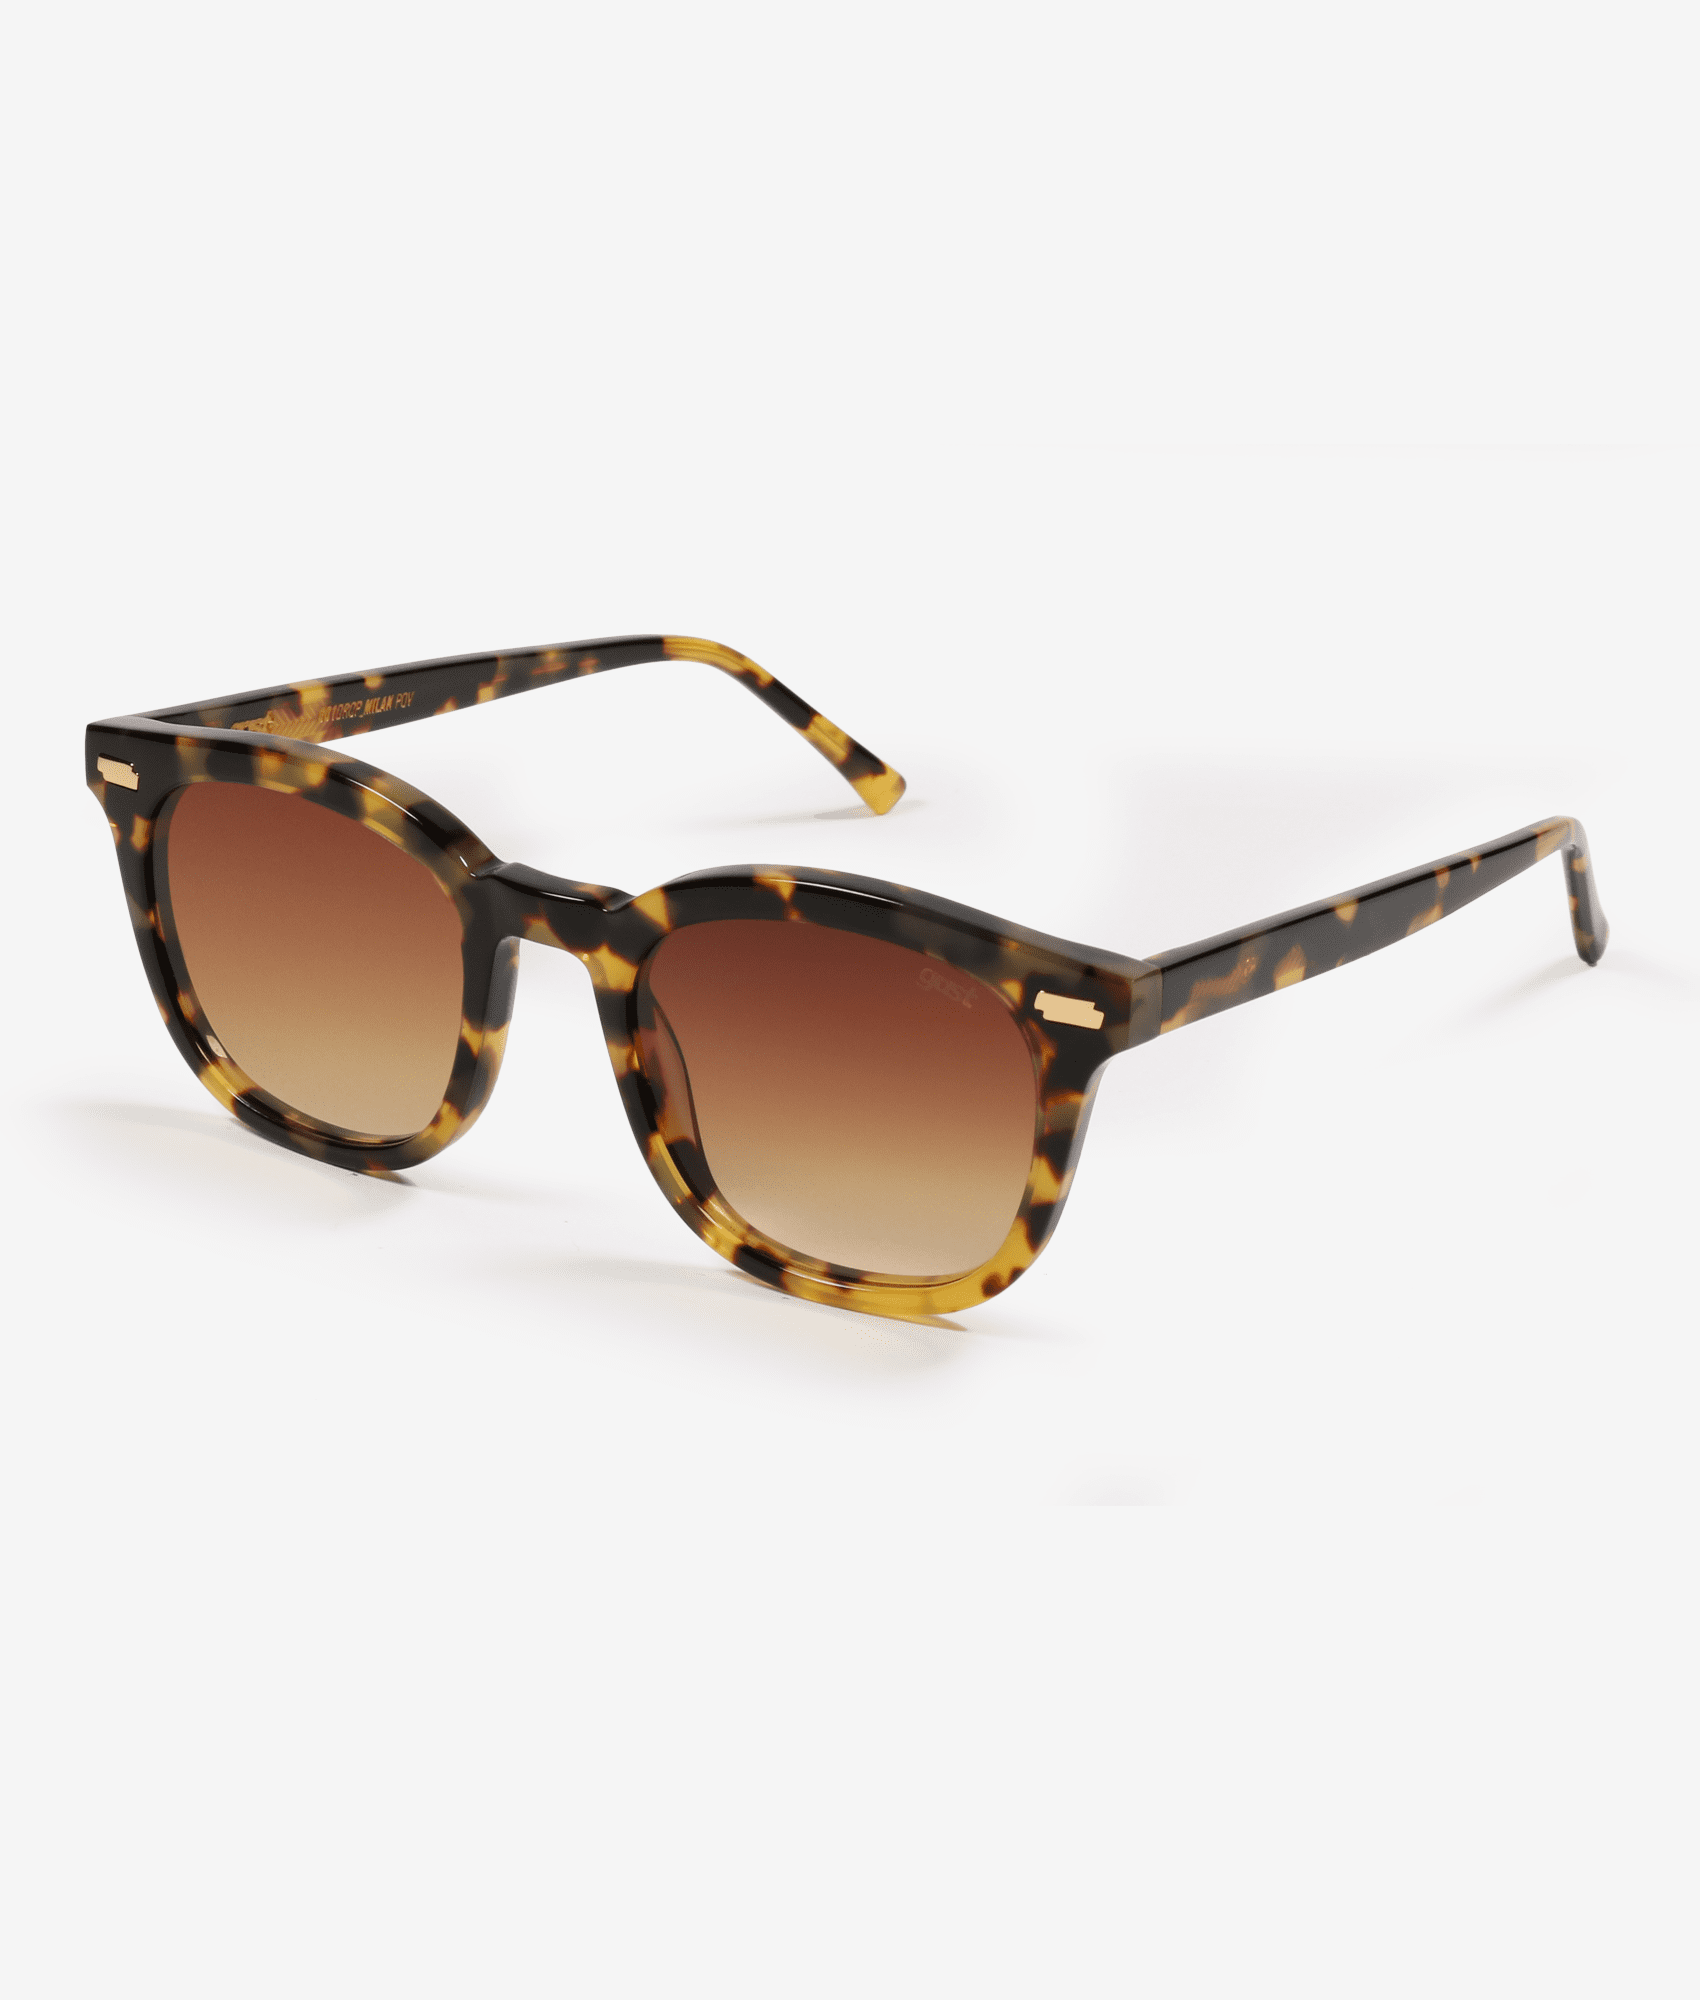 VENTI 159 Gast Sunglasses